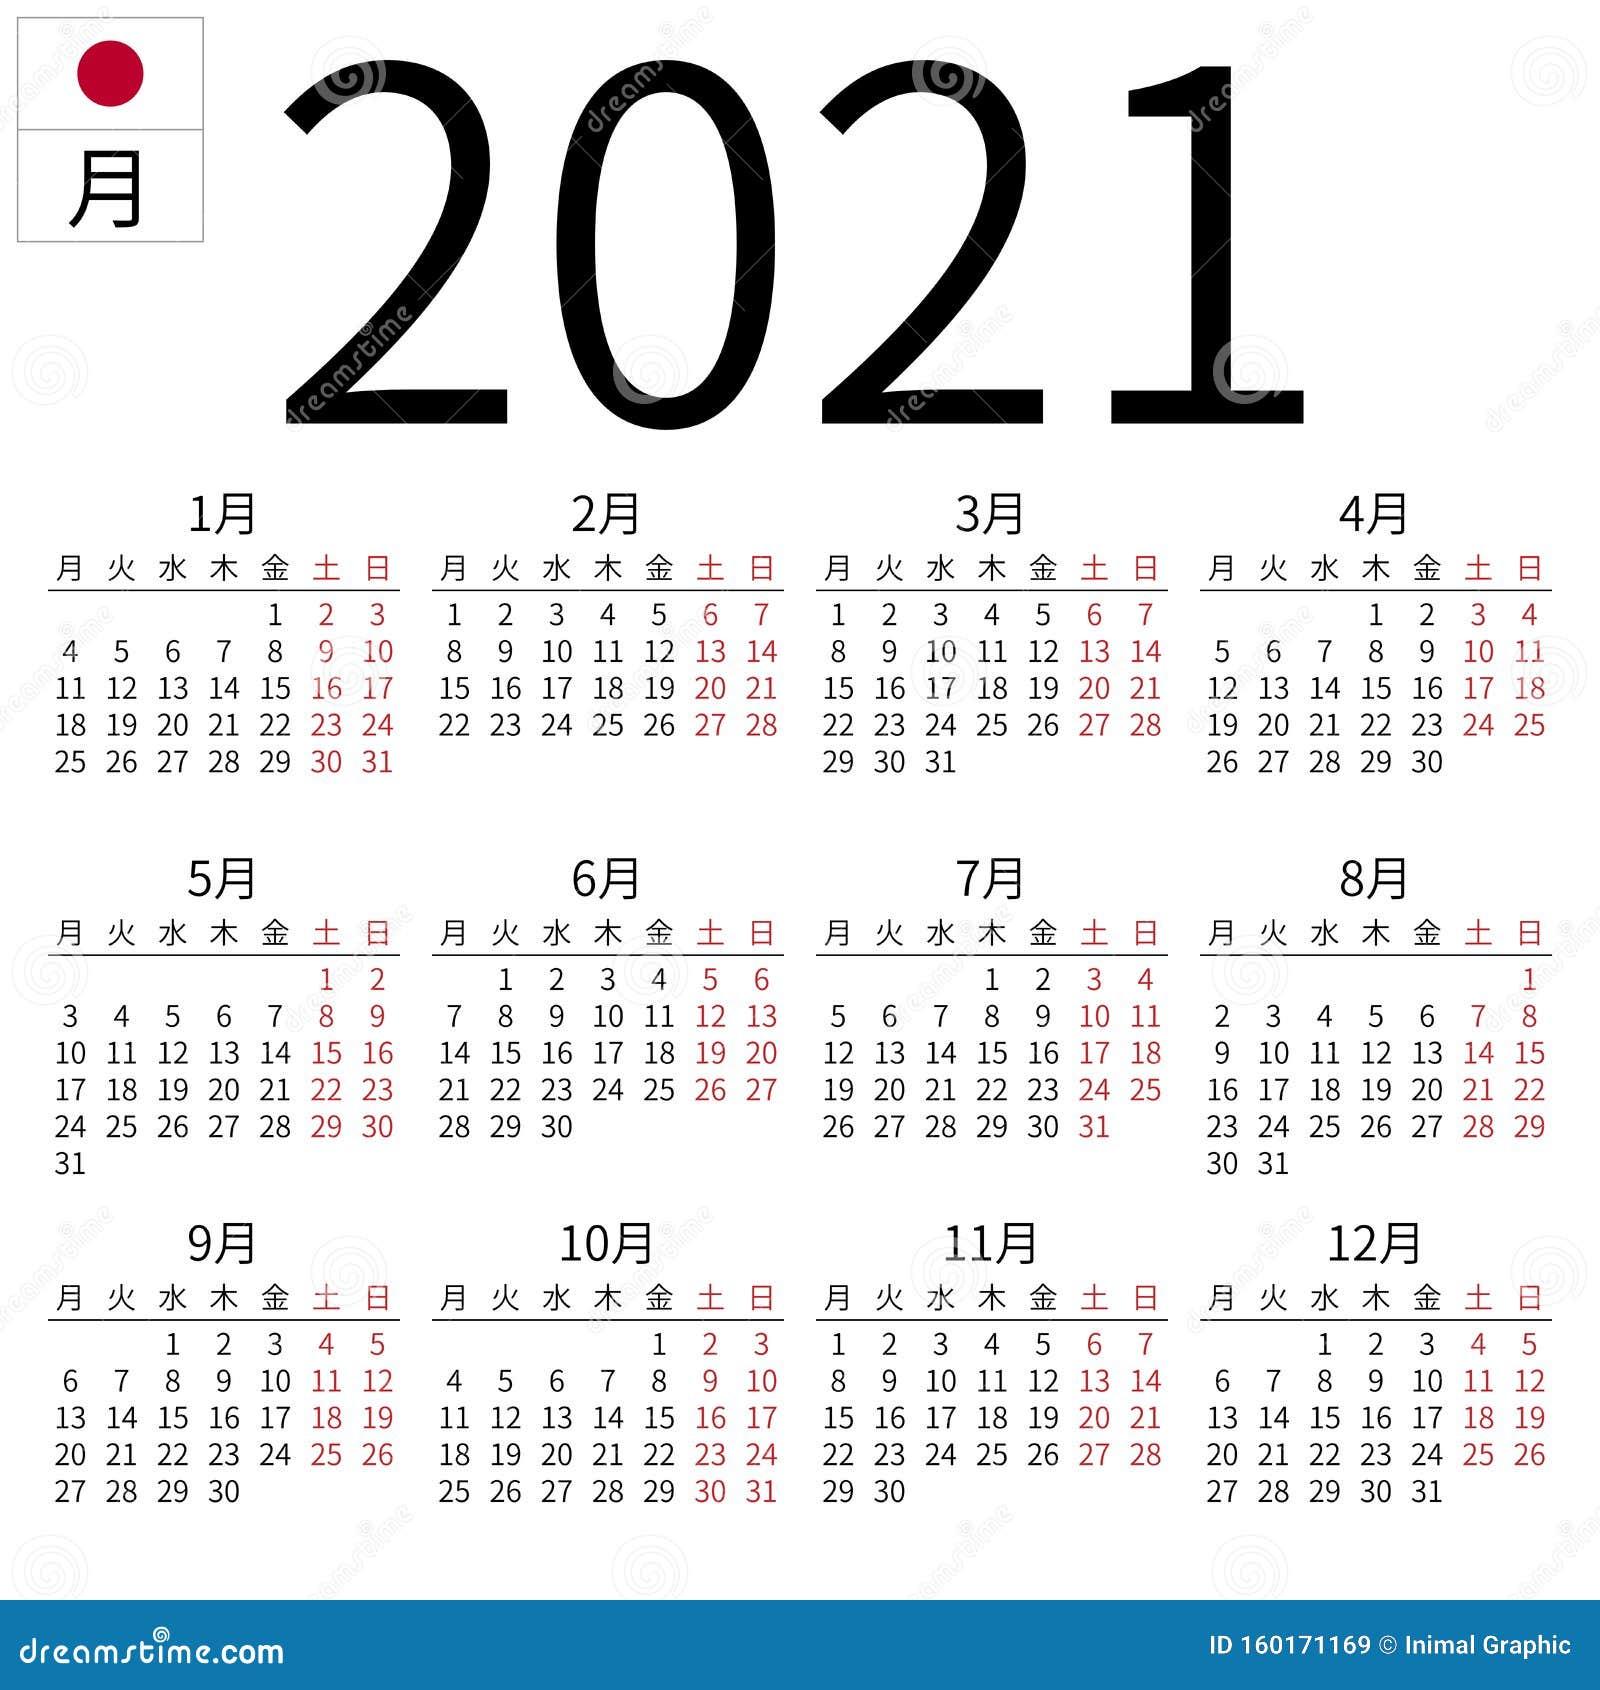 Japanese Holiday Calendar 2021 Wallpaper